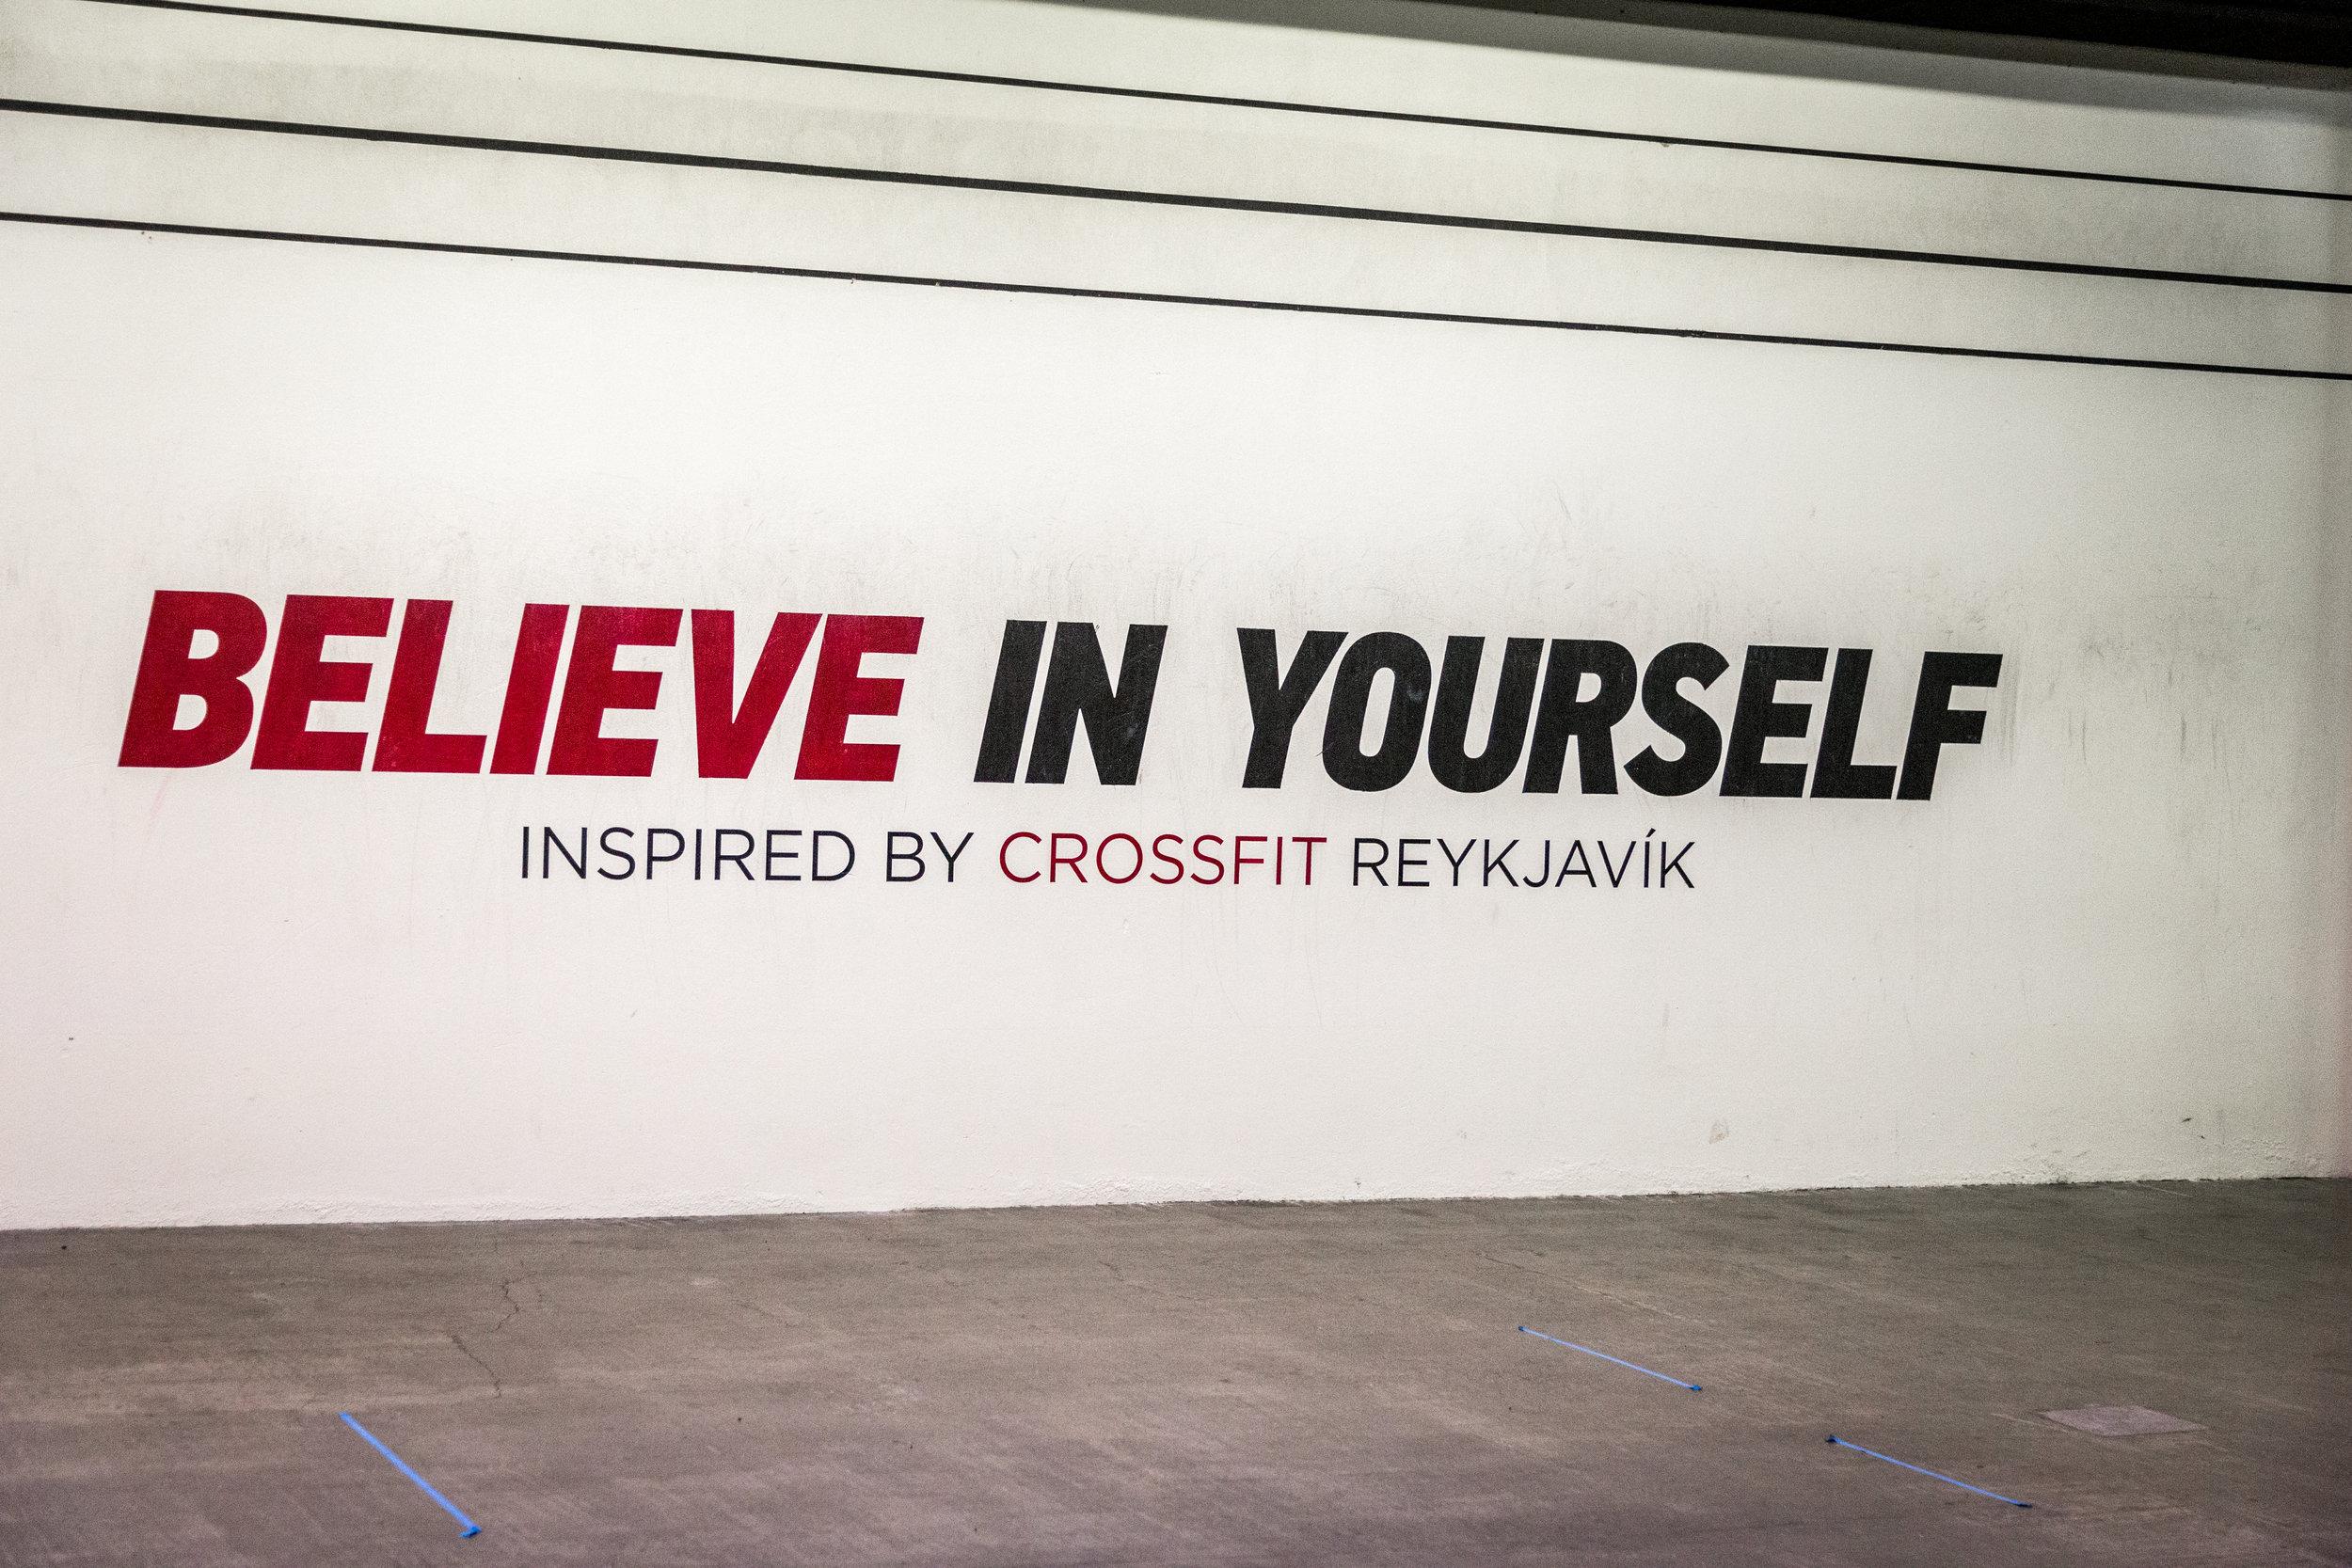 Motivation from @CrossFitReykjavik